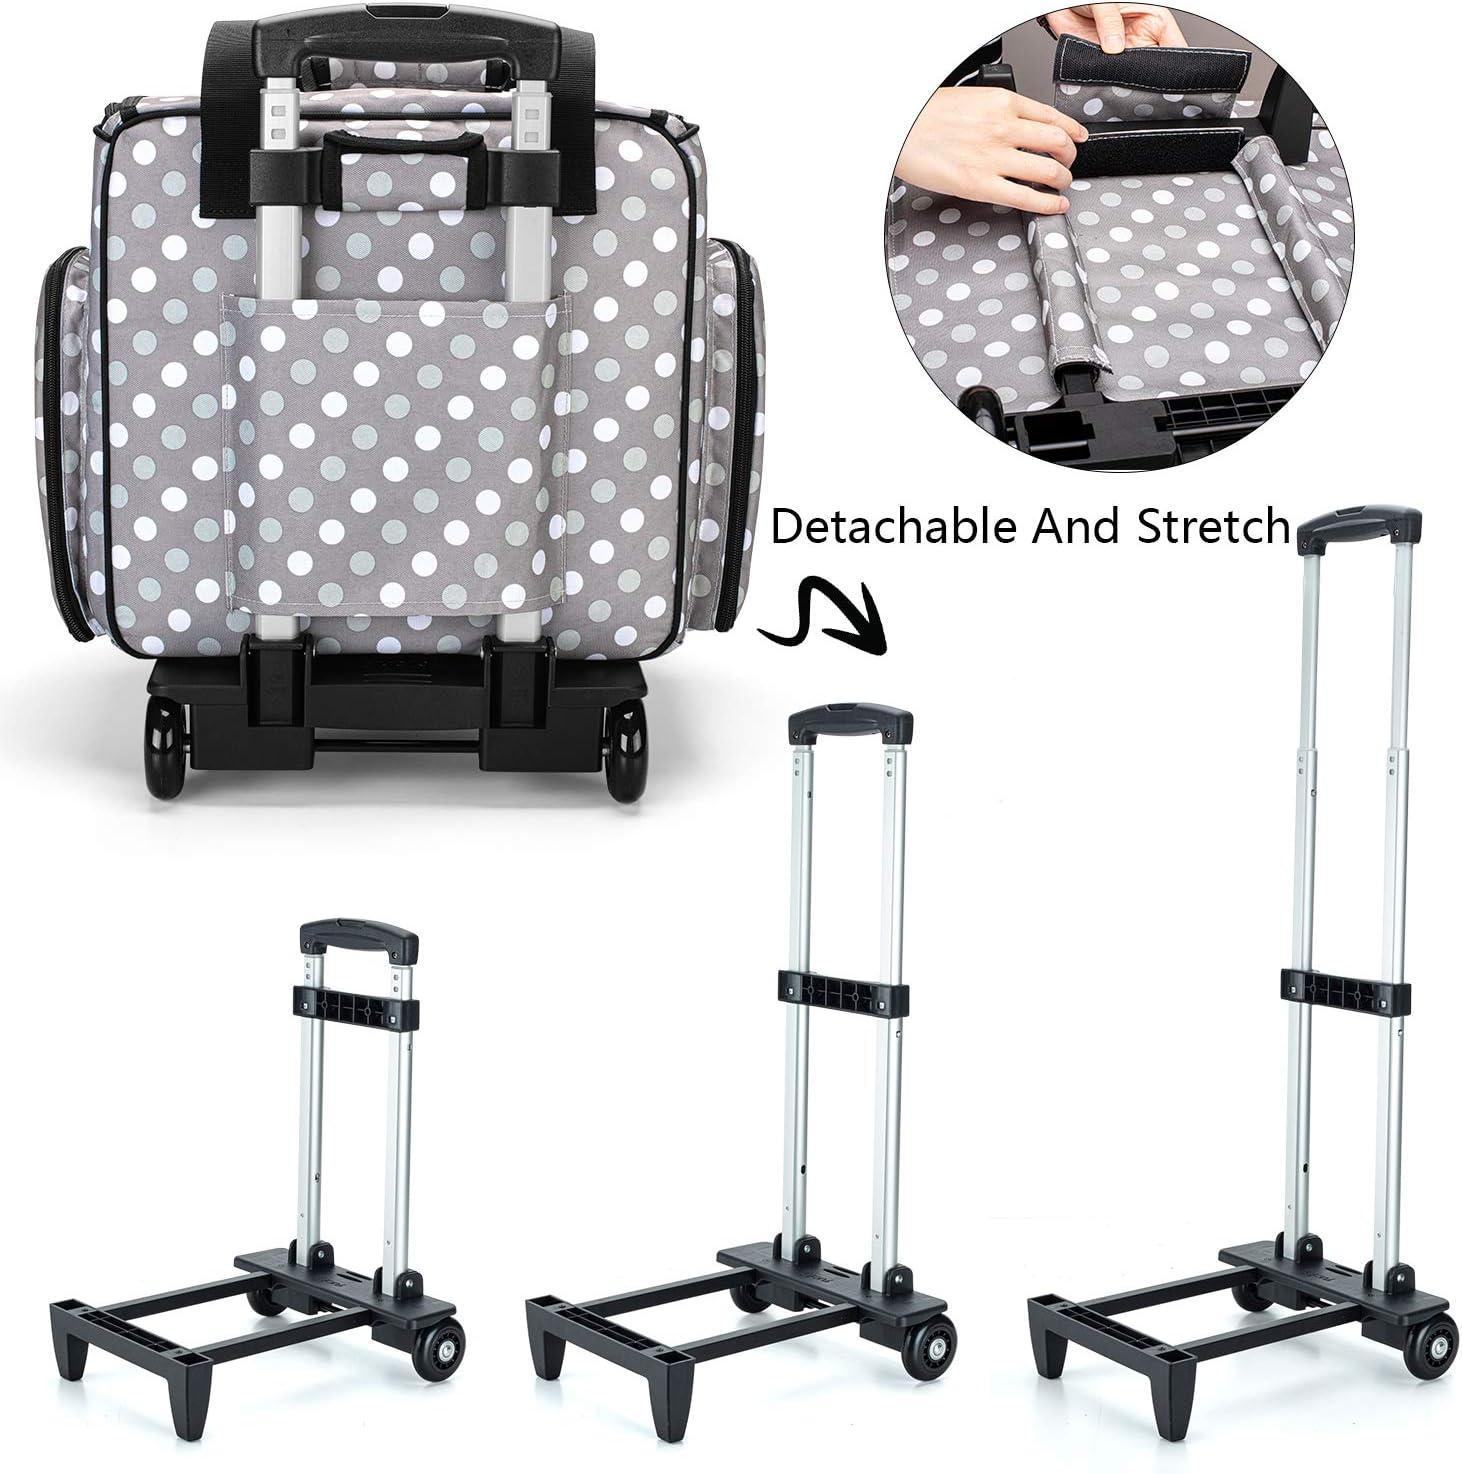 Serger Bag for Most Standard Overlocker Machine Overlocker Case with Detachable Trolley Dolly Grey Luxja Overlocker Bag